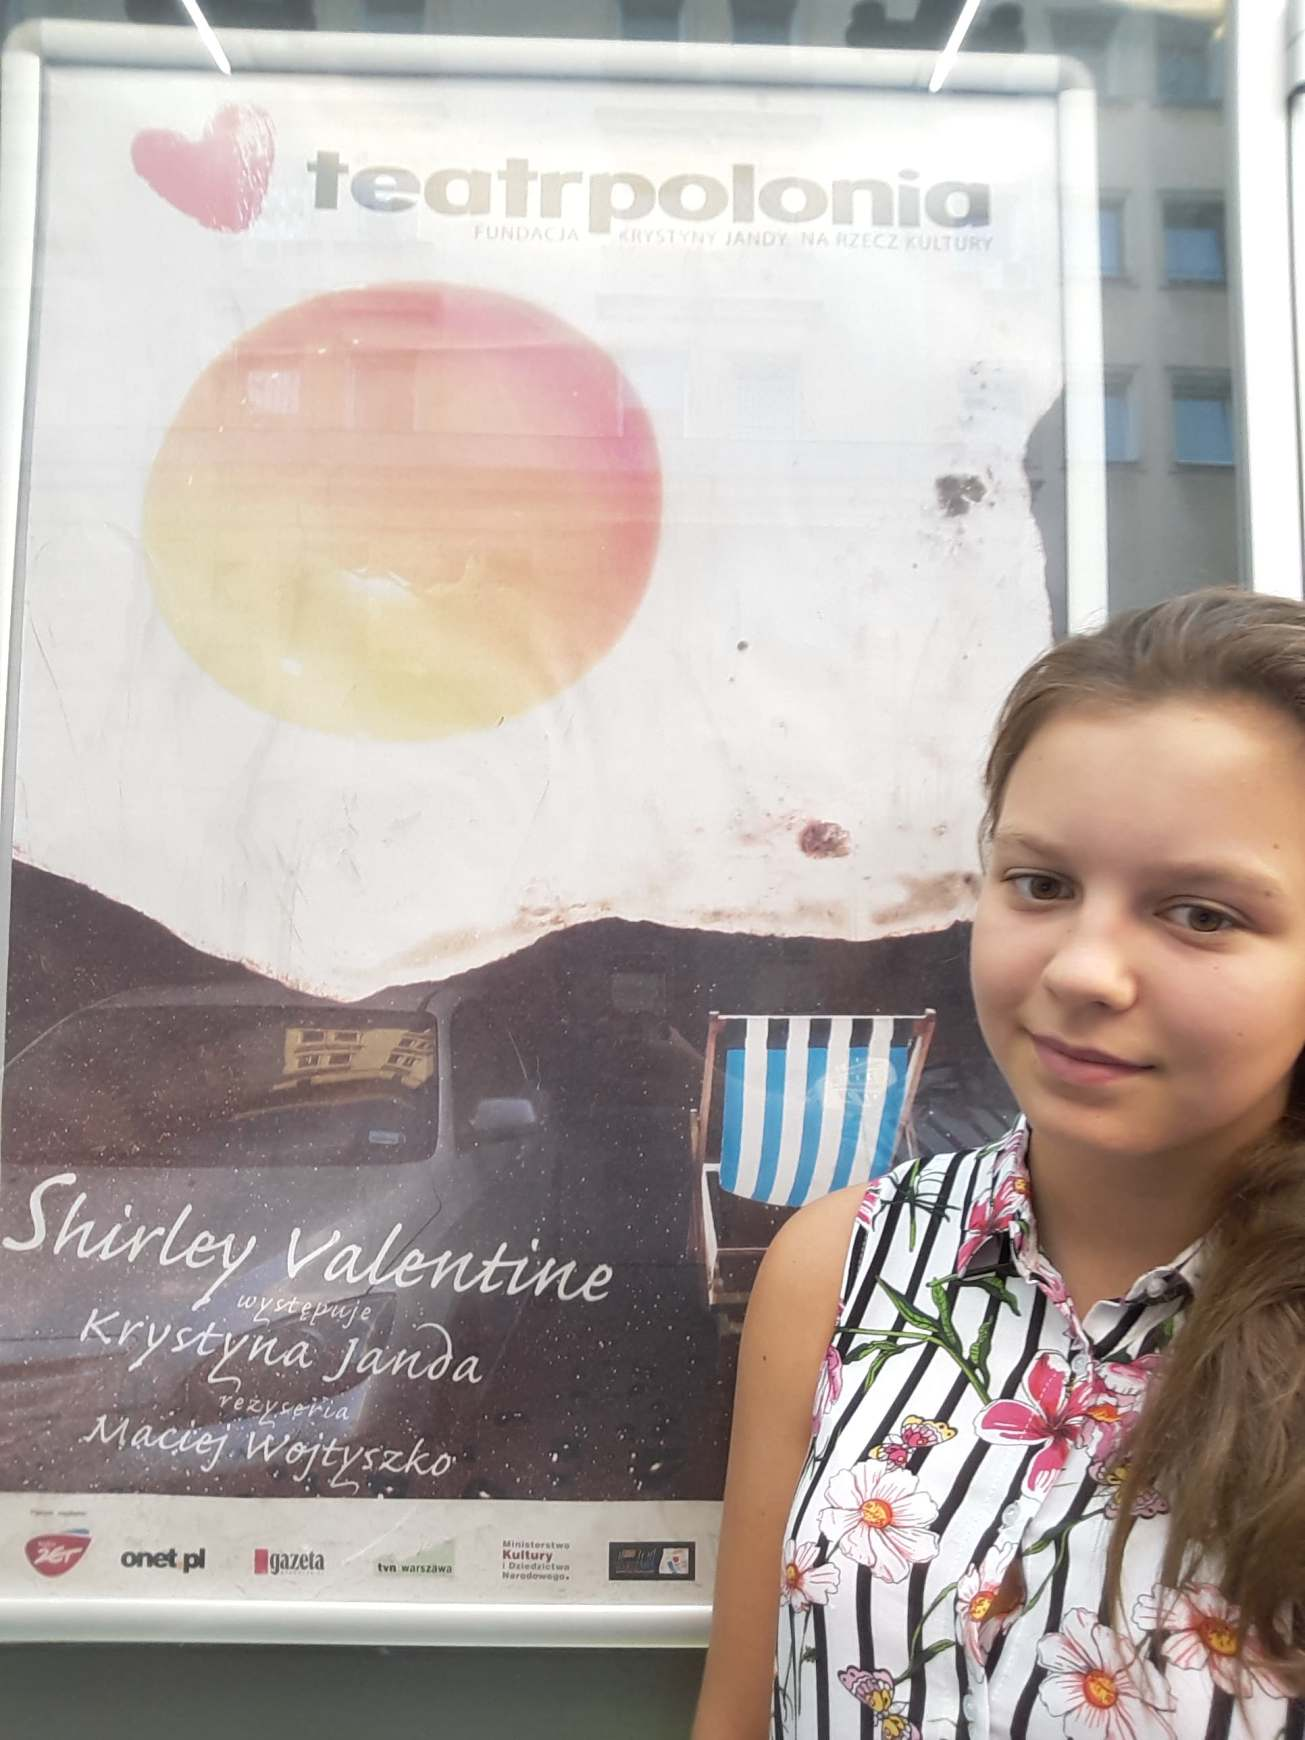 Shirley Valentine, Teatr Polonia, Krystyna Janda